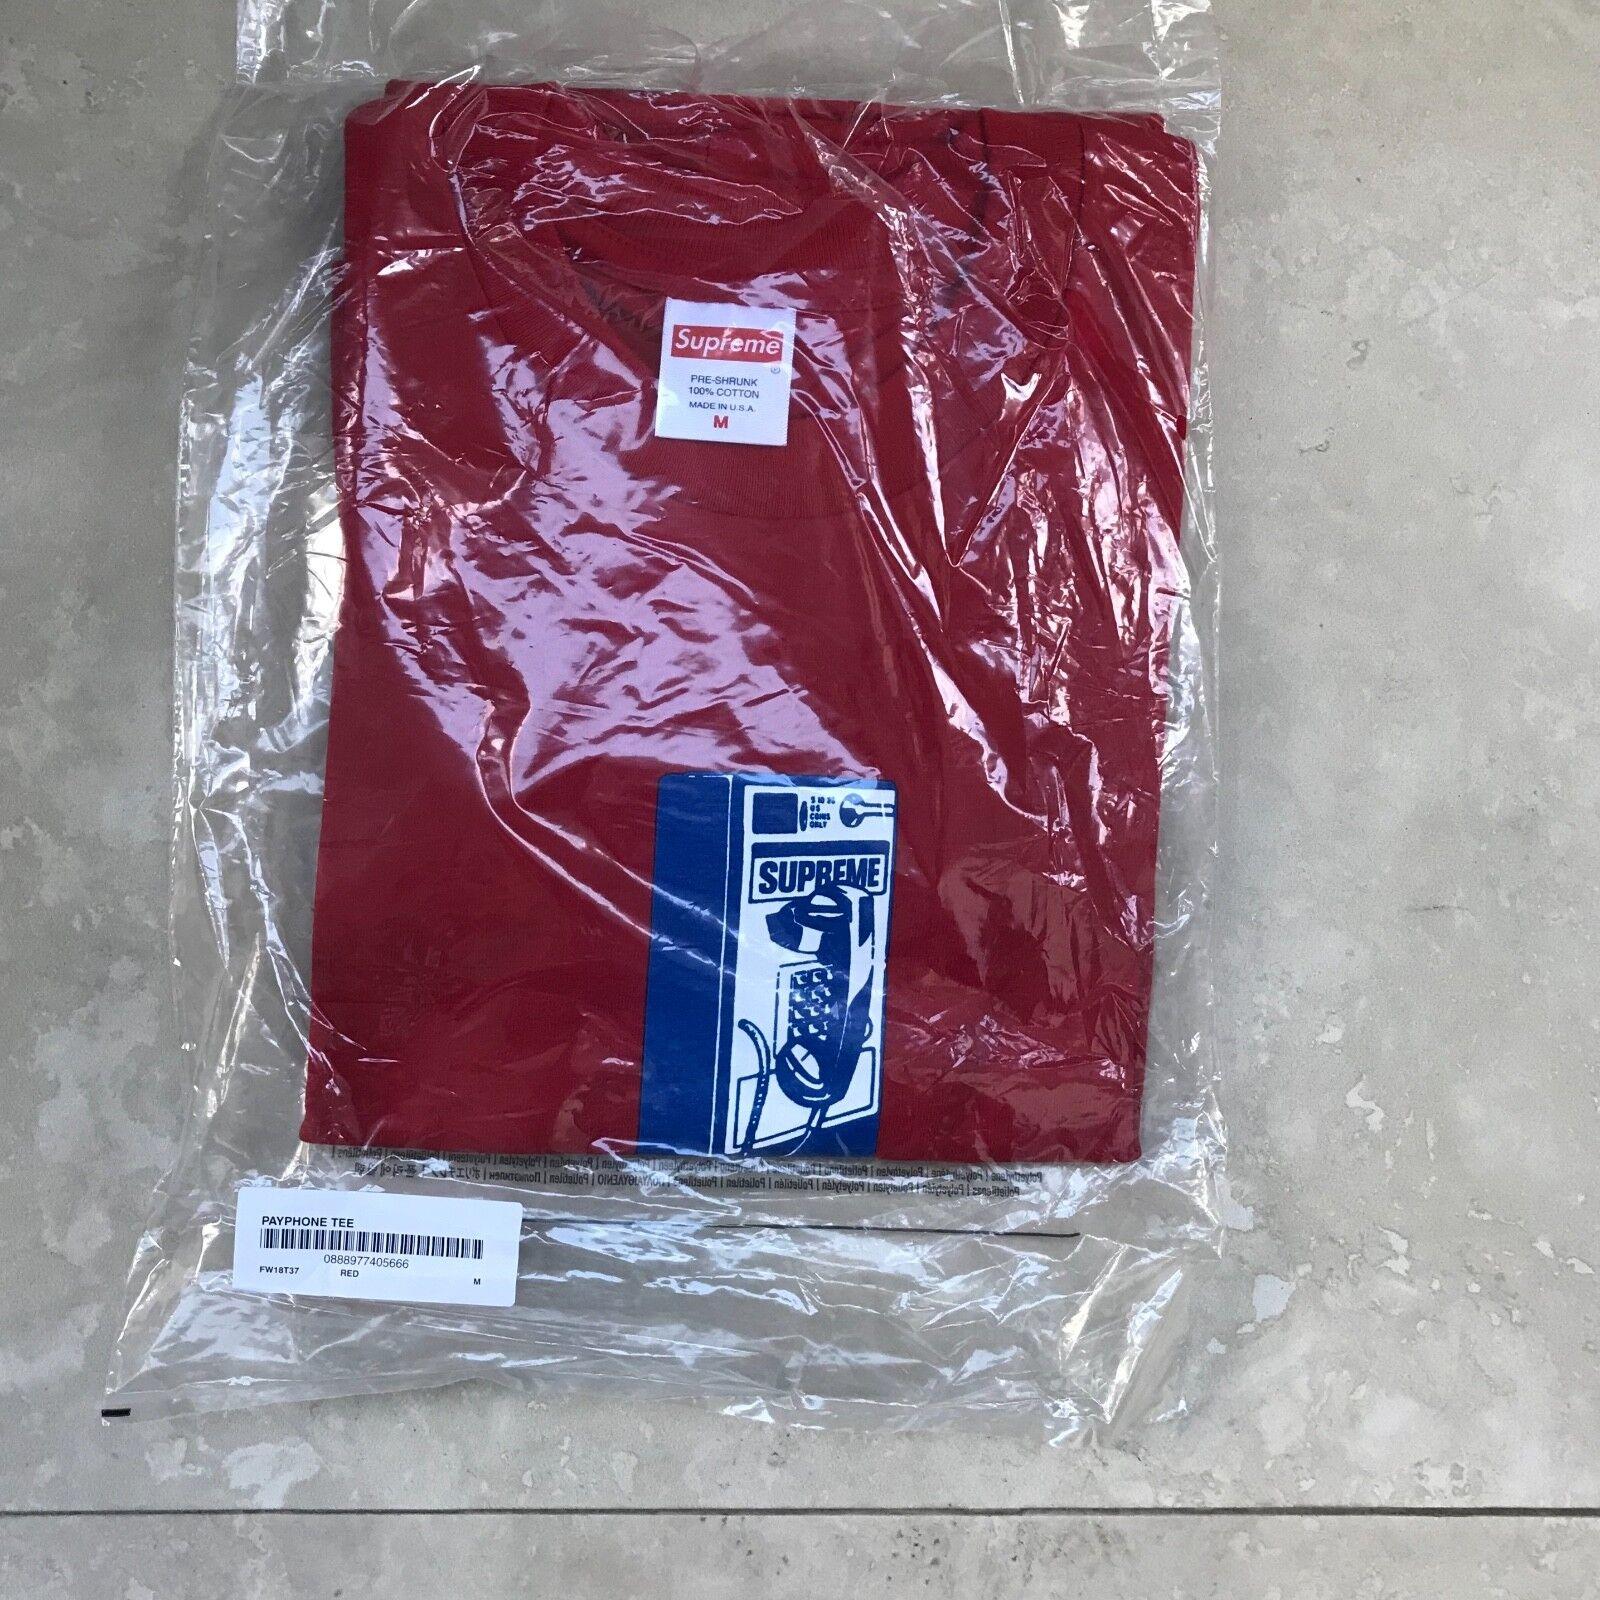 SUPREME PAYPHONE T-SHIRT ROT Größe Medium BOX LOGO Mark Gonzales Jason Dill GZA